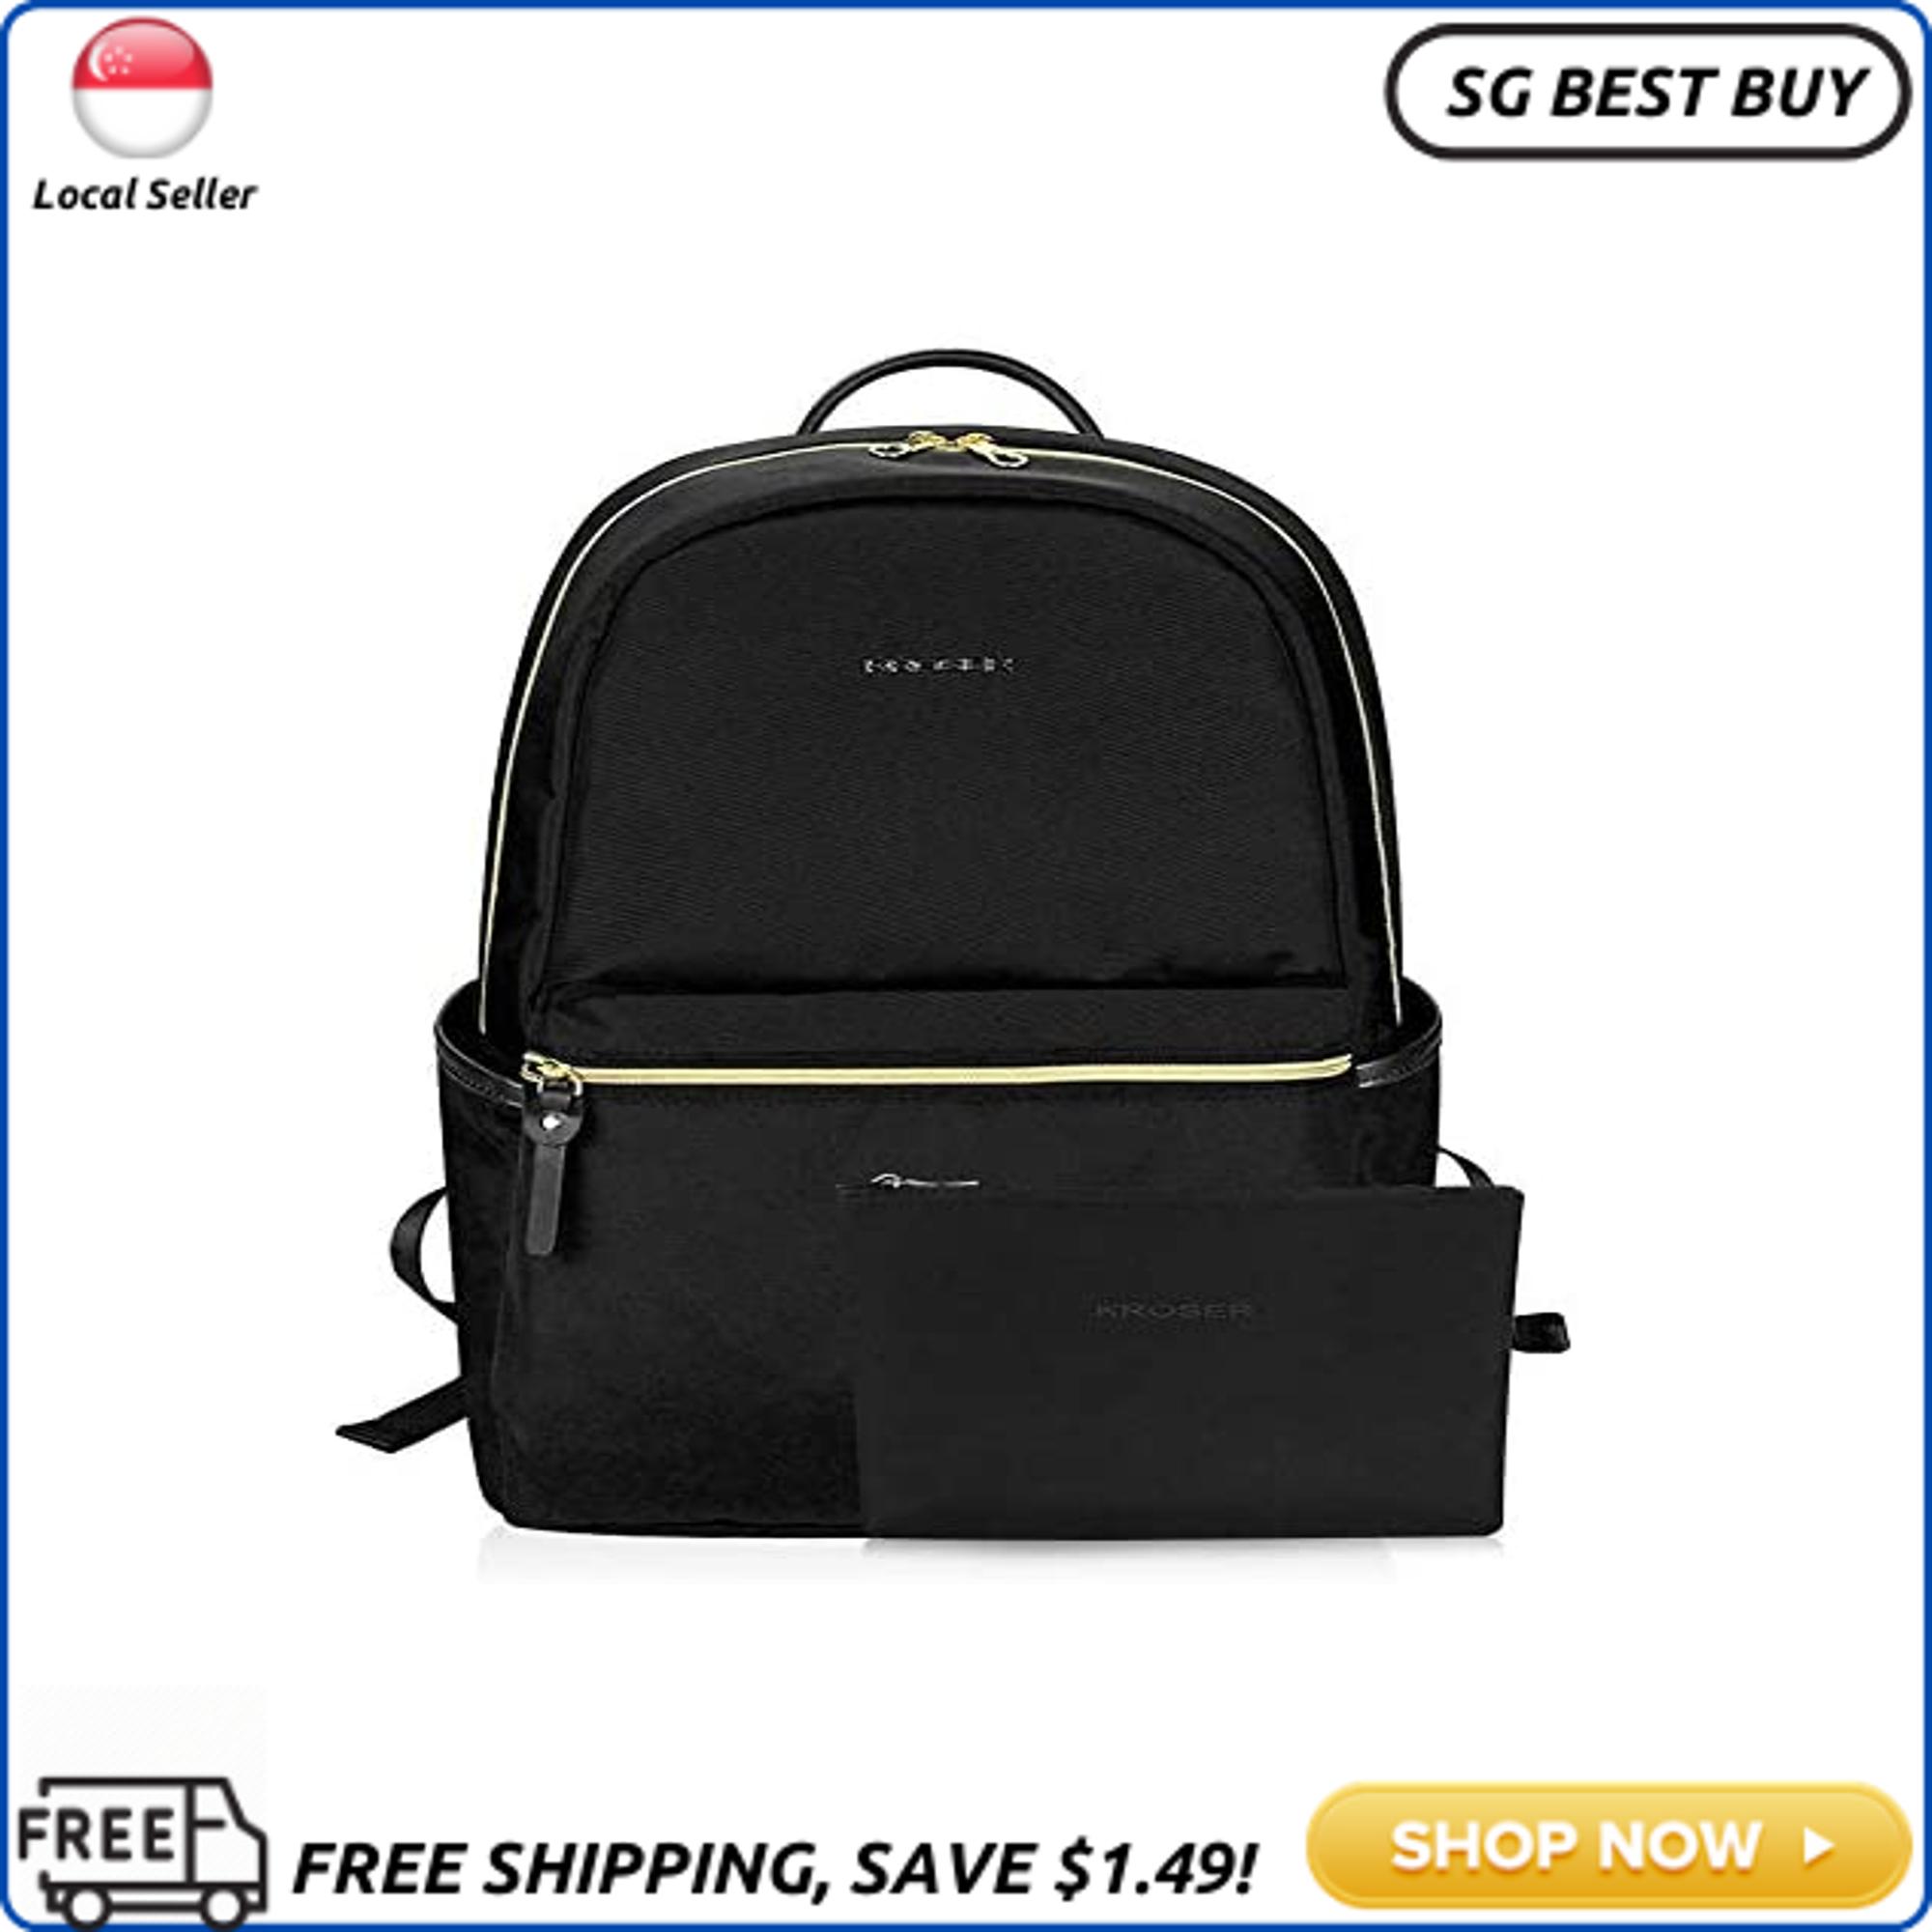 (SG SELLER) KROSER Laptop Backpack 15.6 Inch Upgraded Fashion School Backpack Water-Repellent Cumpter Backpack Laptop Bag Nylon Casual Daypack with USB Charging Port for Travel/Business/College/Women/Men-Black